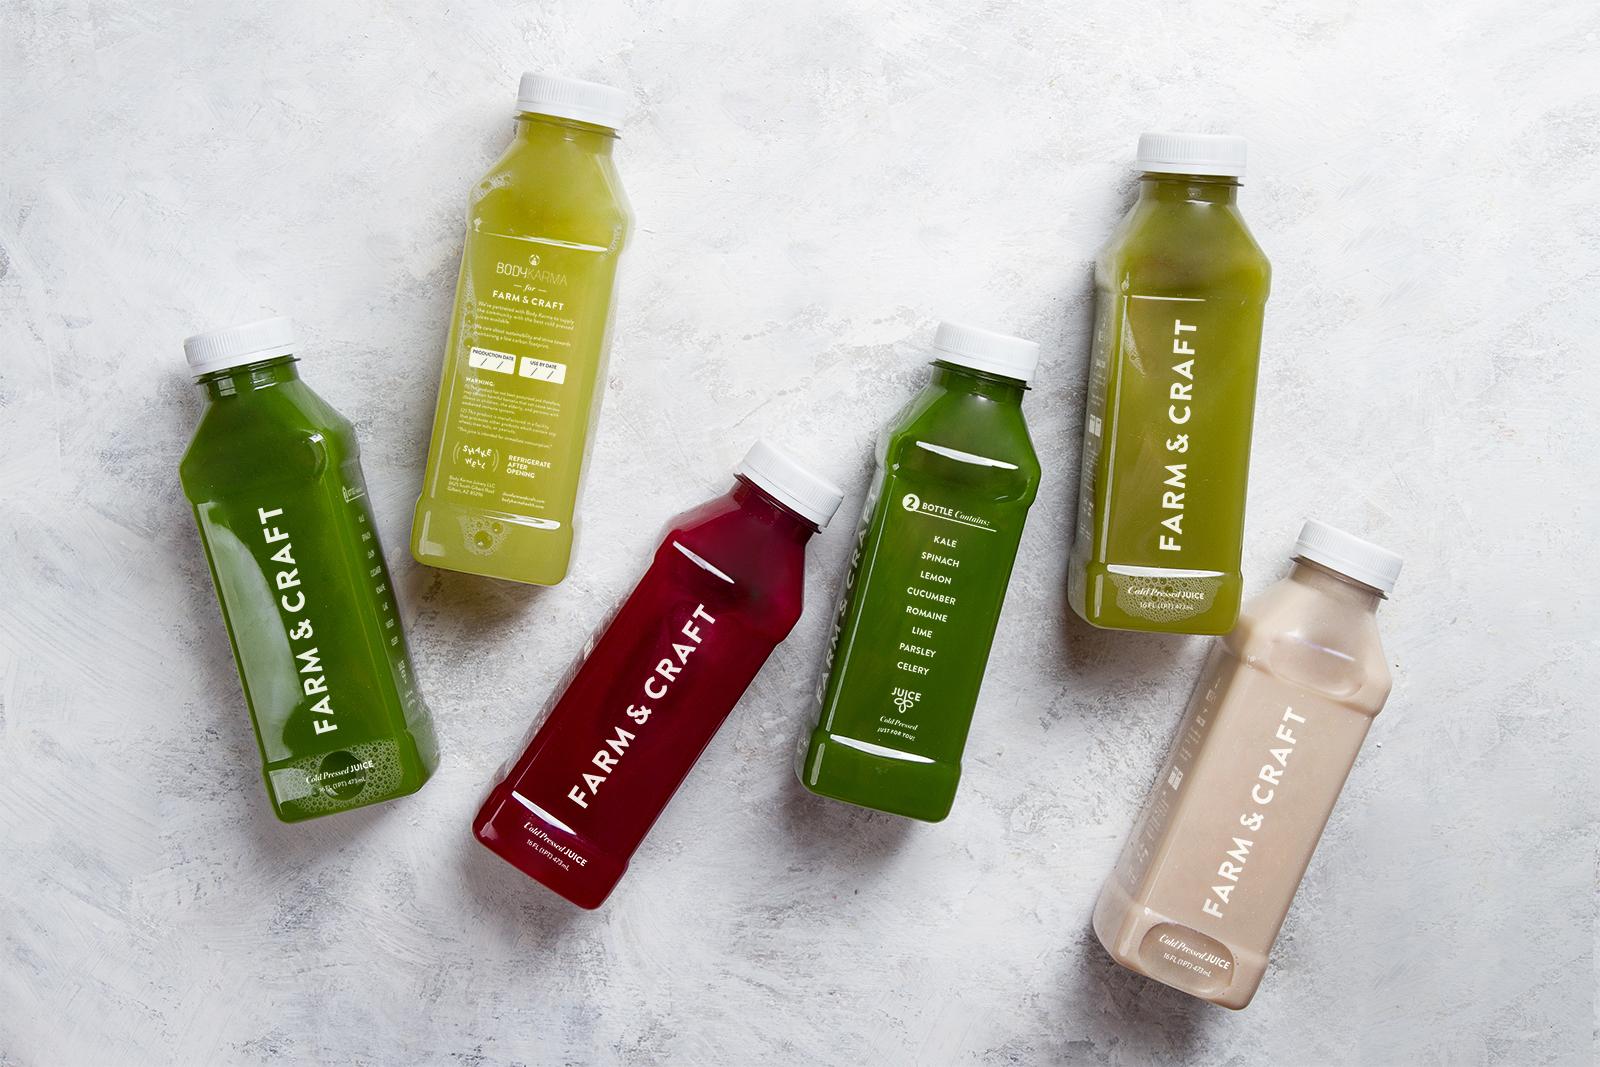 Packaging: Cold Pressed Juice